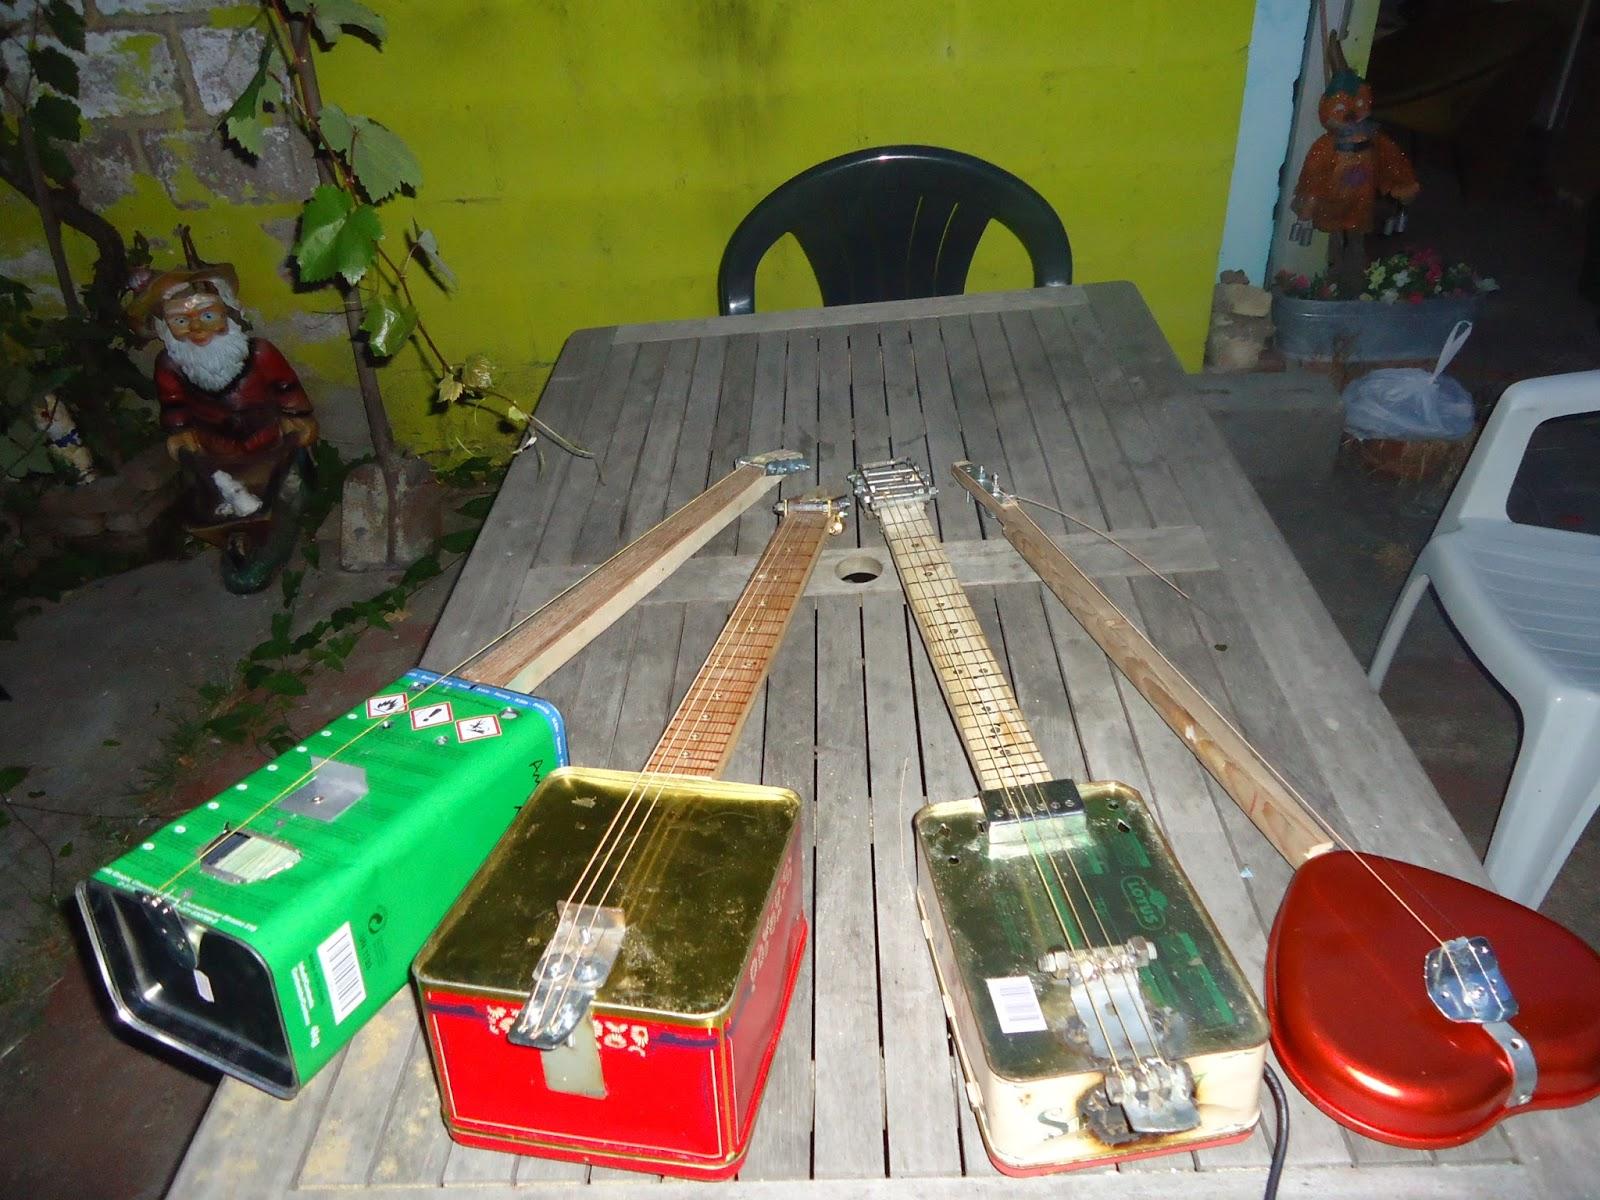 les cigarboxguitar de J--A--C DSC02102